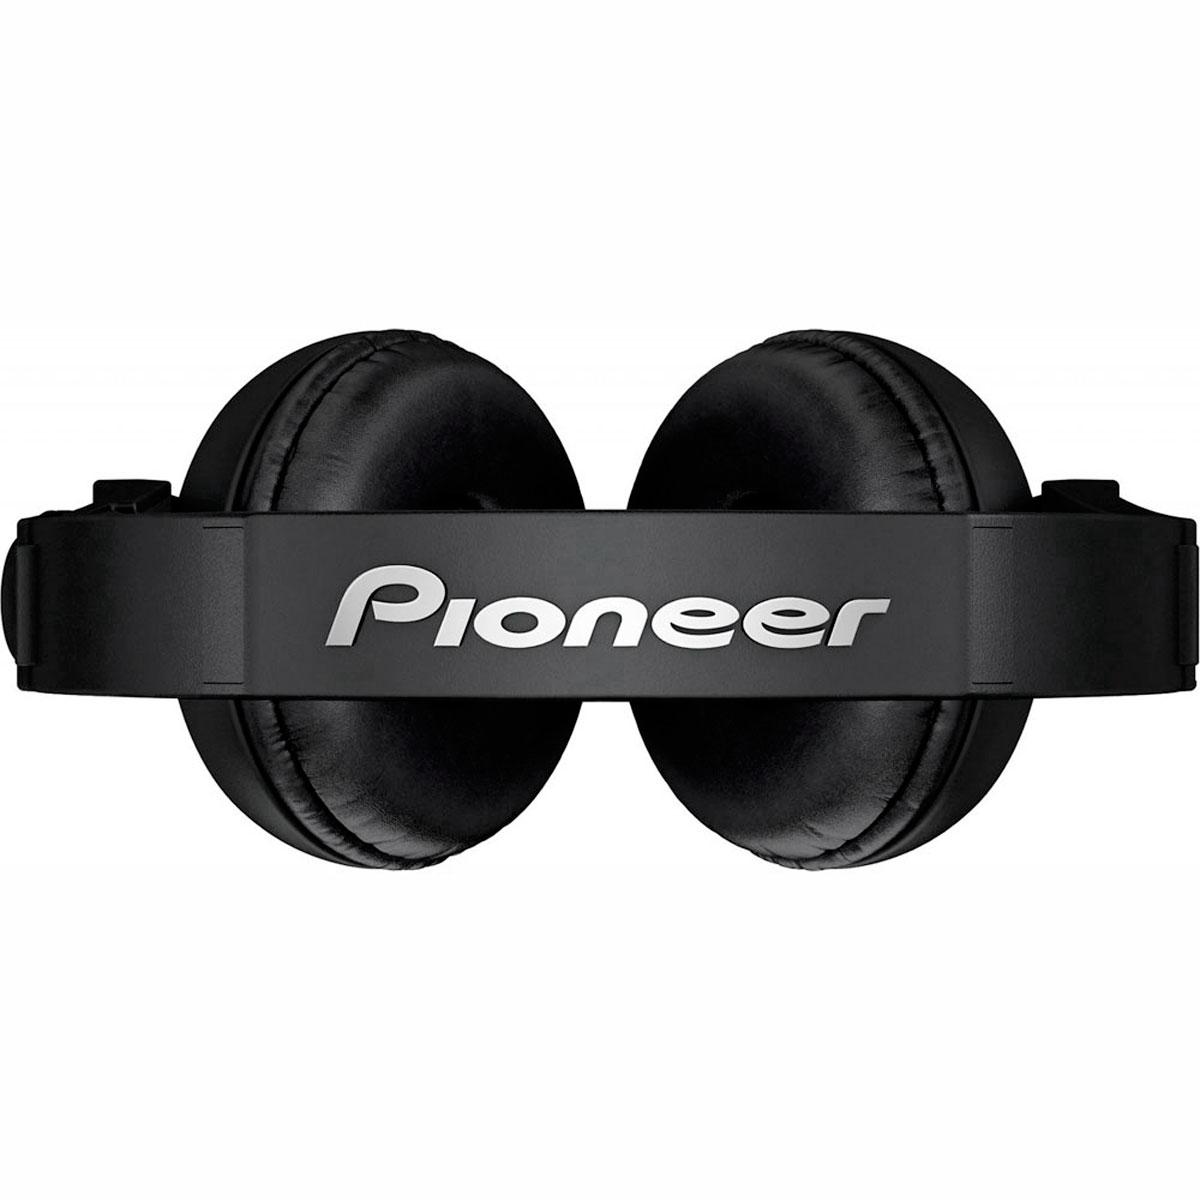 HDJ500 - Fone de Ouvido Over-ear Preto HDJ 500 - Pioneer